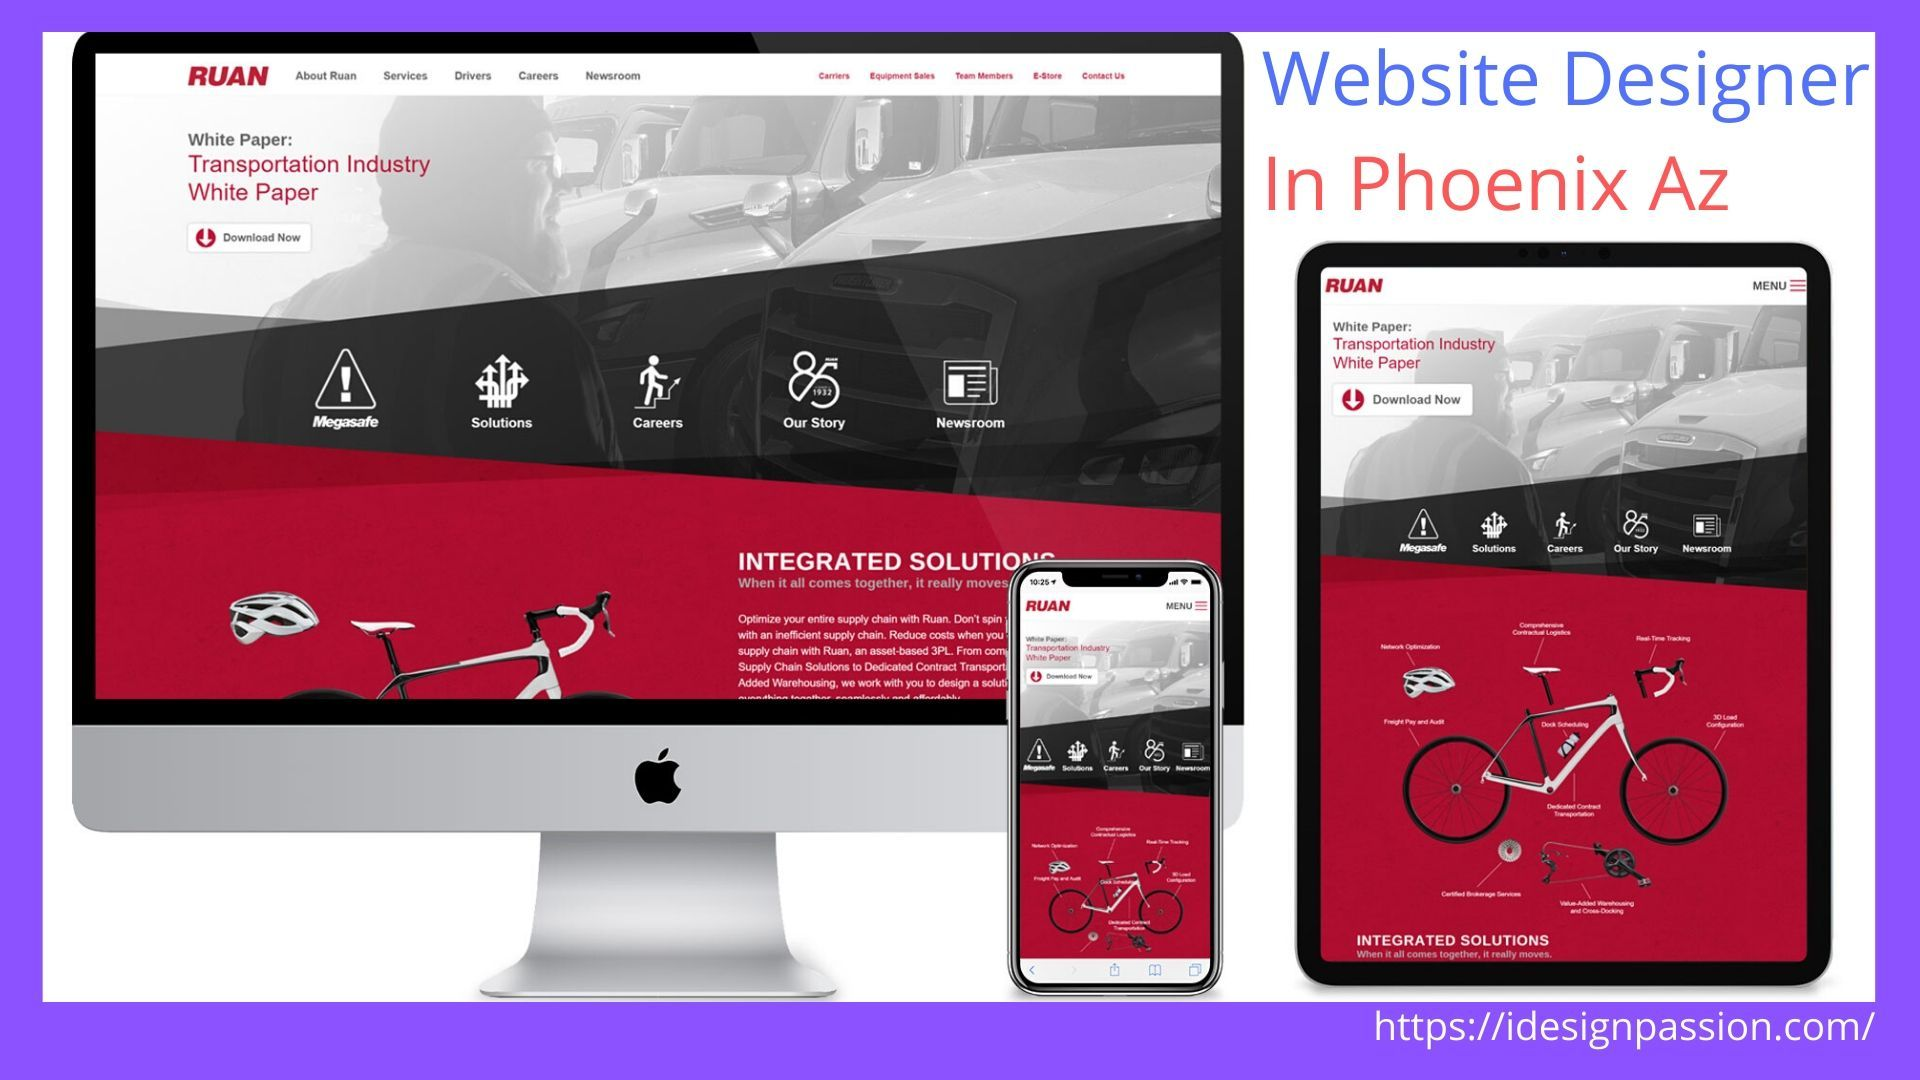 Website Designers In Phoenix Az Web Development Design Website Design Website Design Company